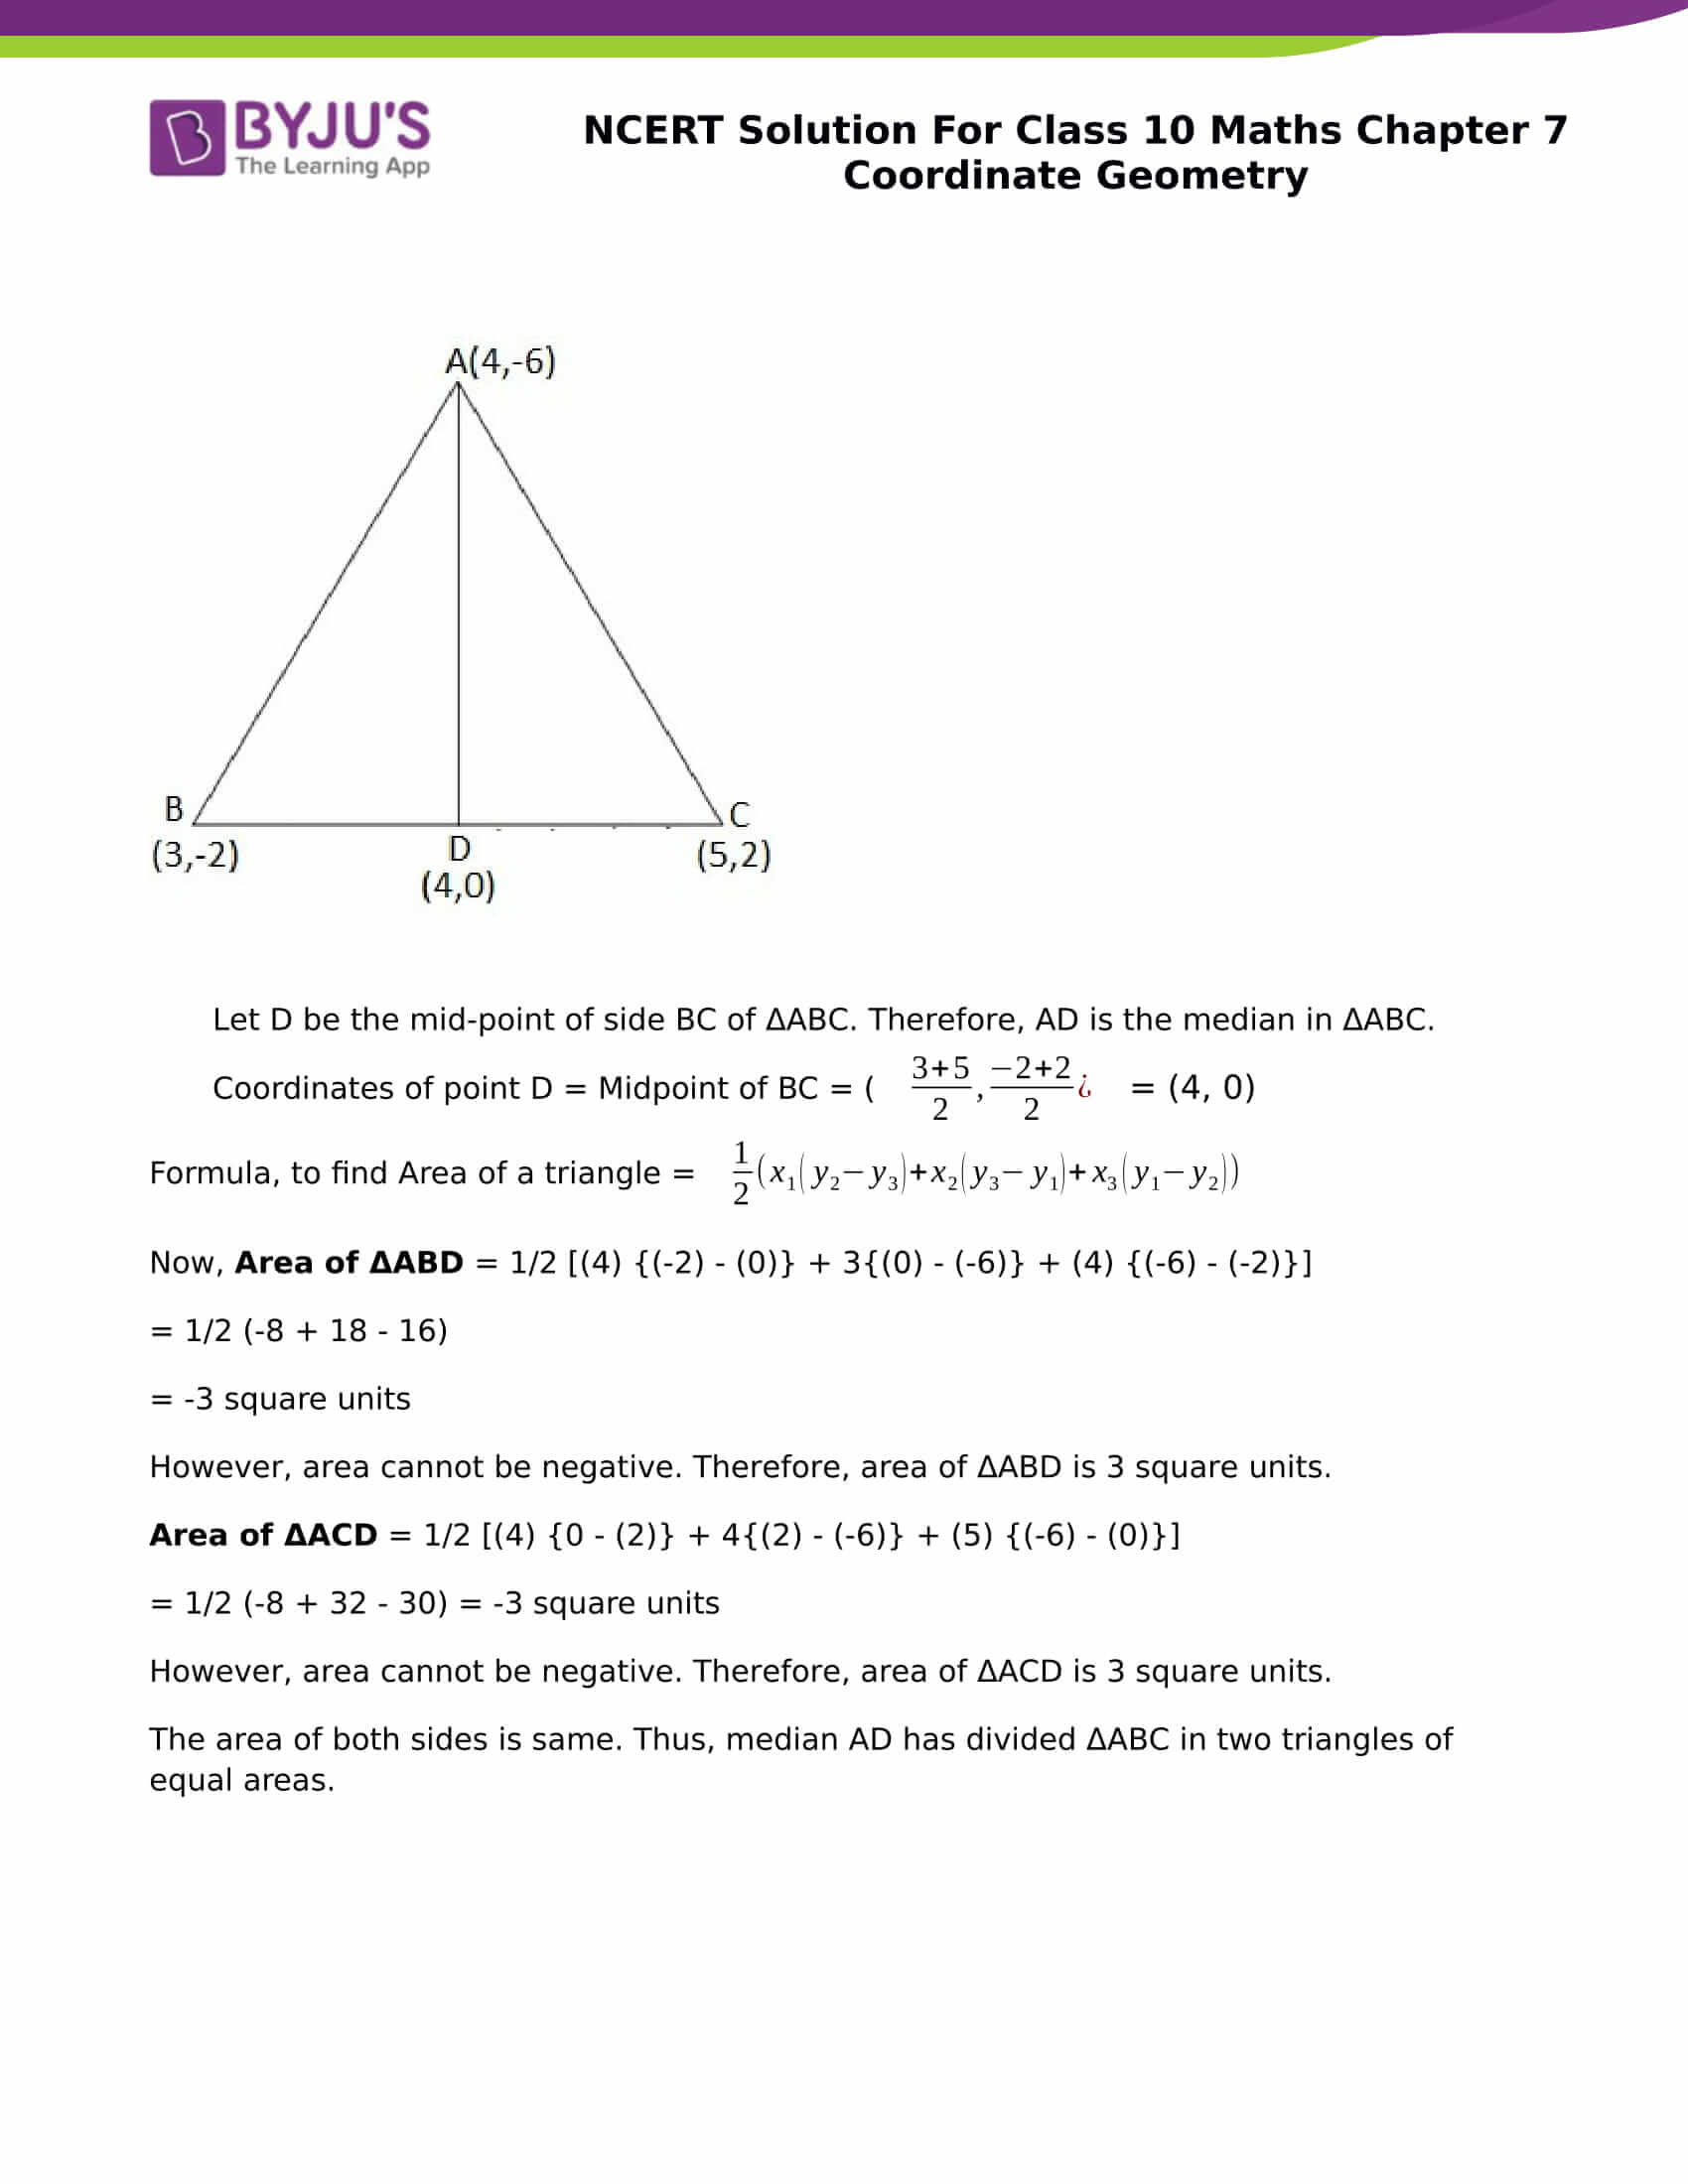 NCERT Solution for class 10 Maths chapter 7 Coordinate Geometry Part 21